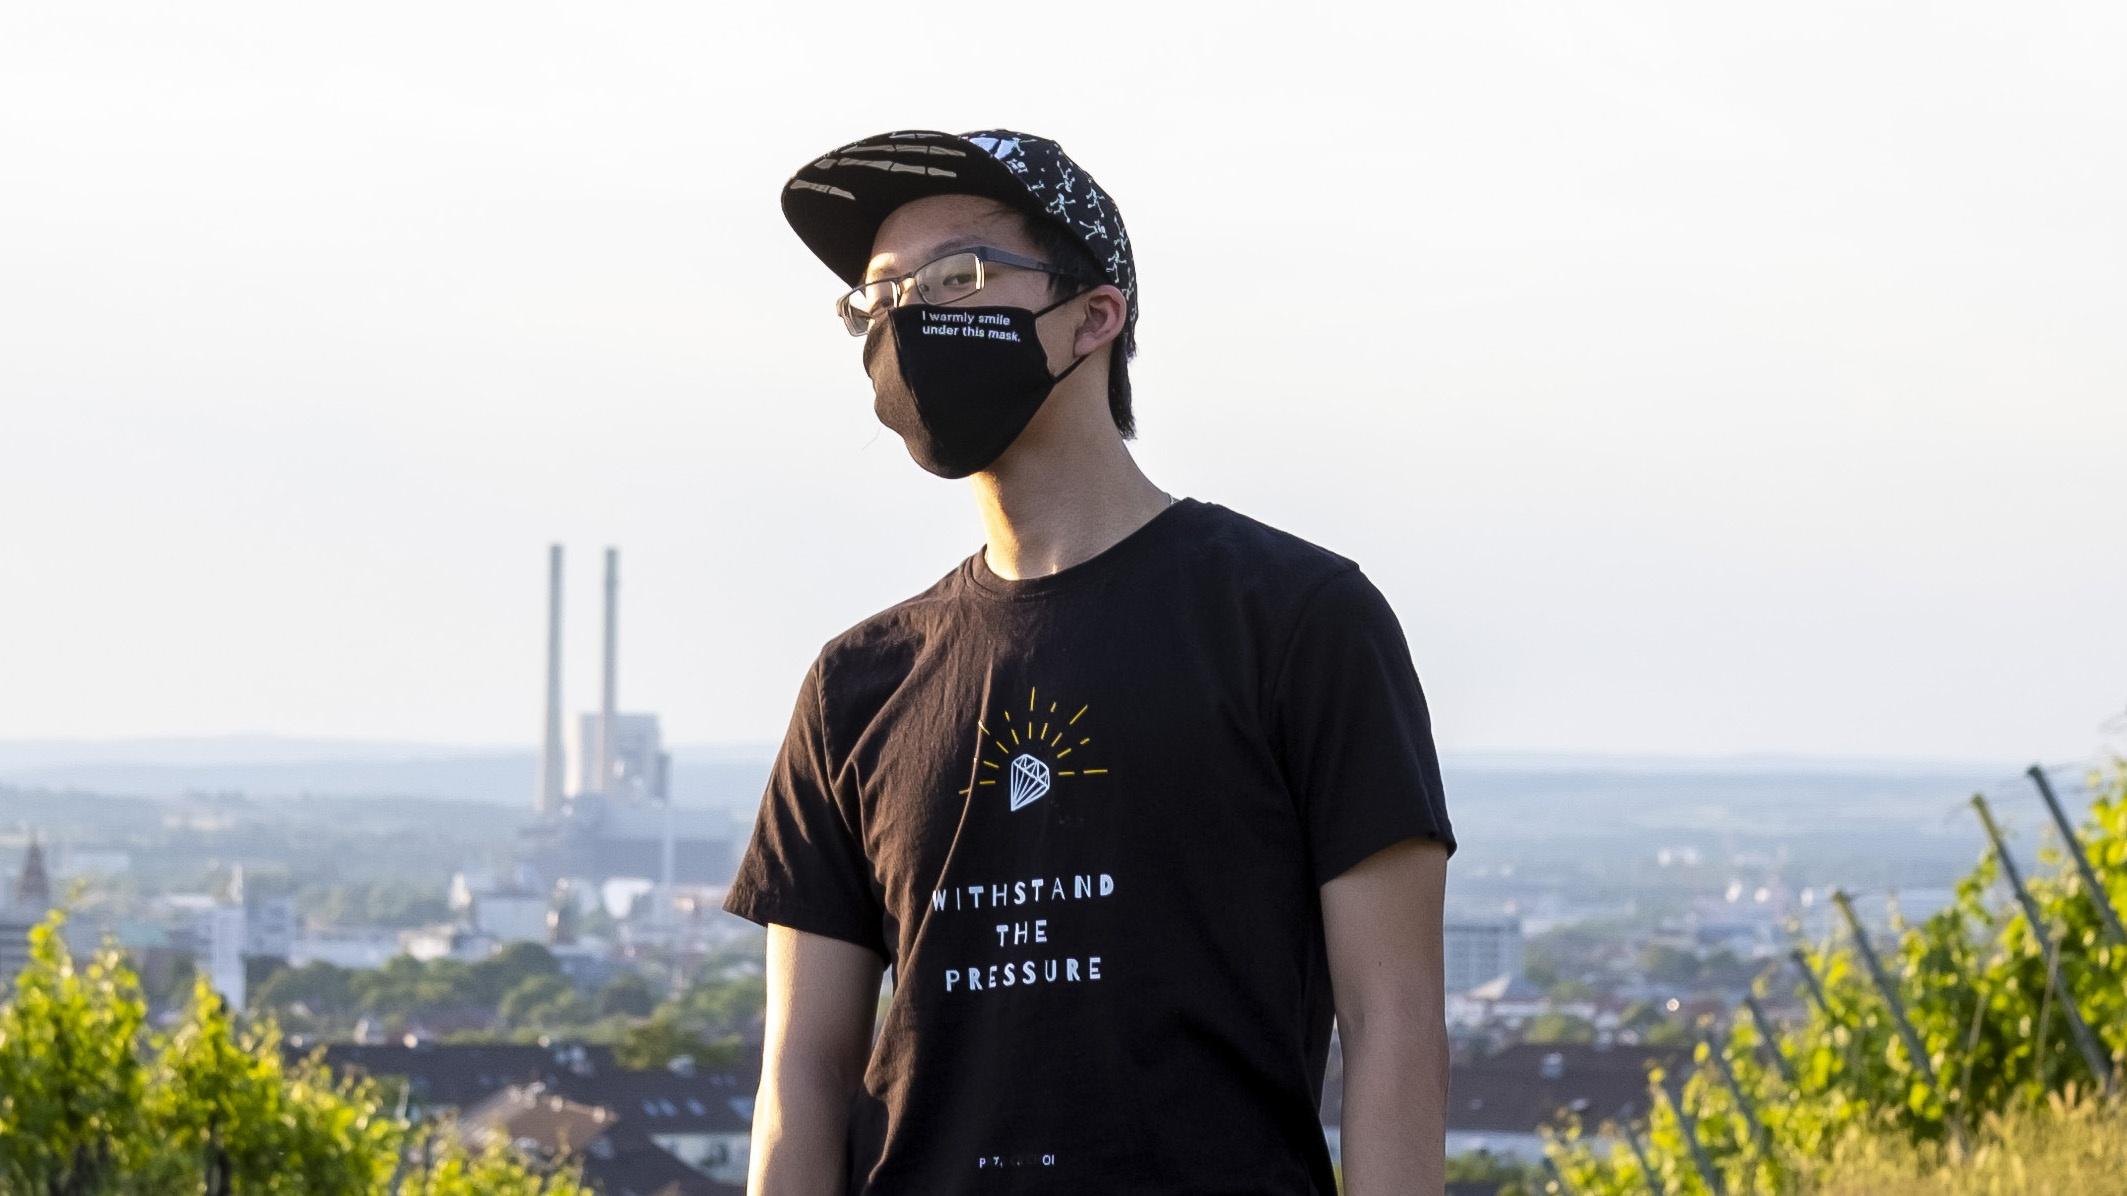 Patrick choi photography shirt design